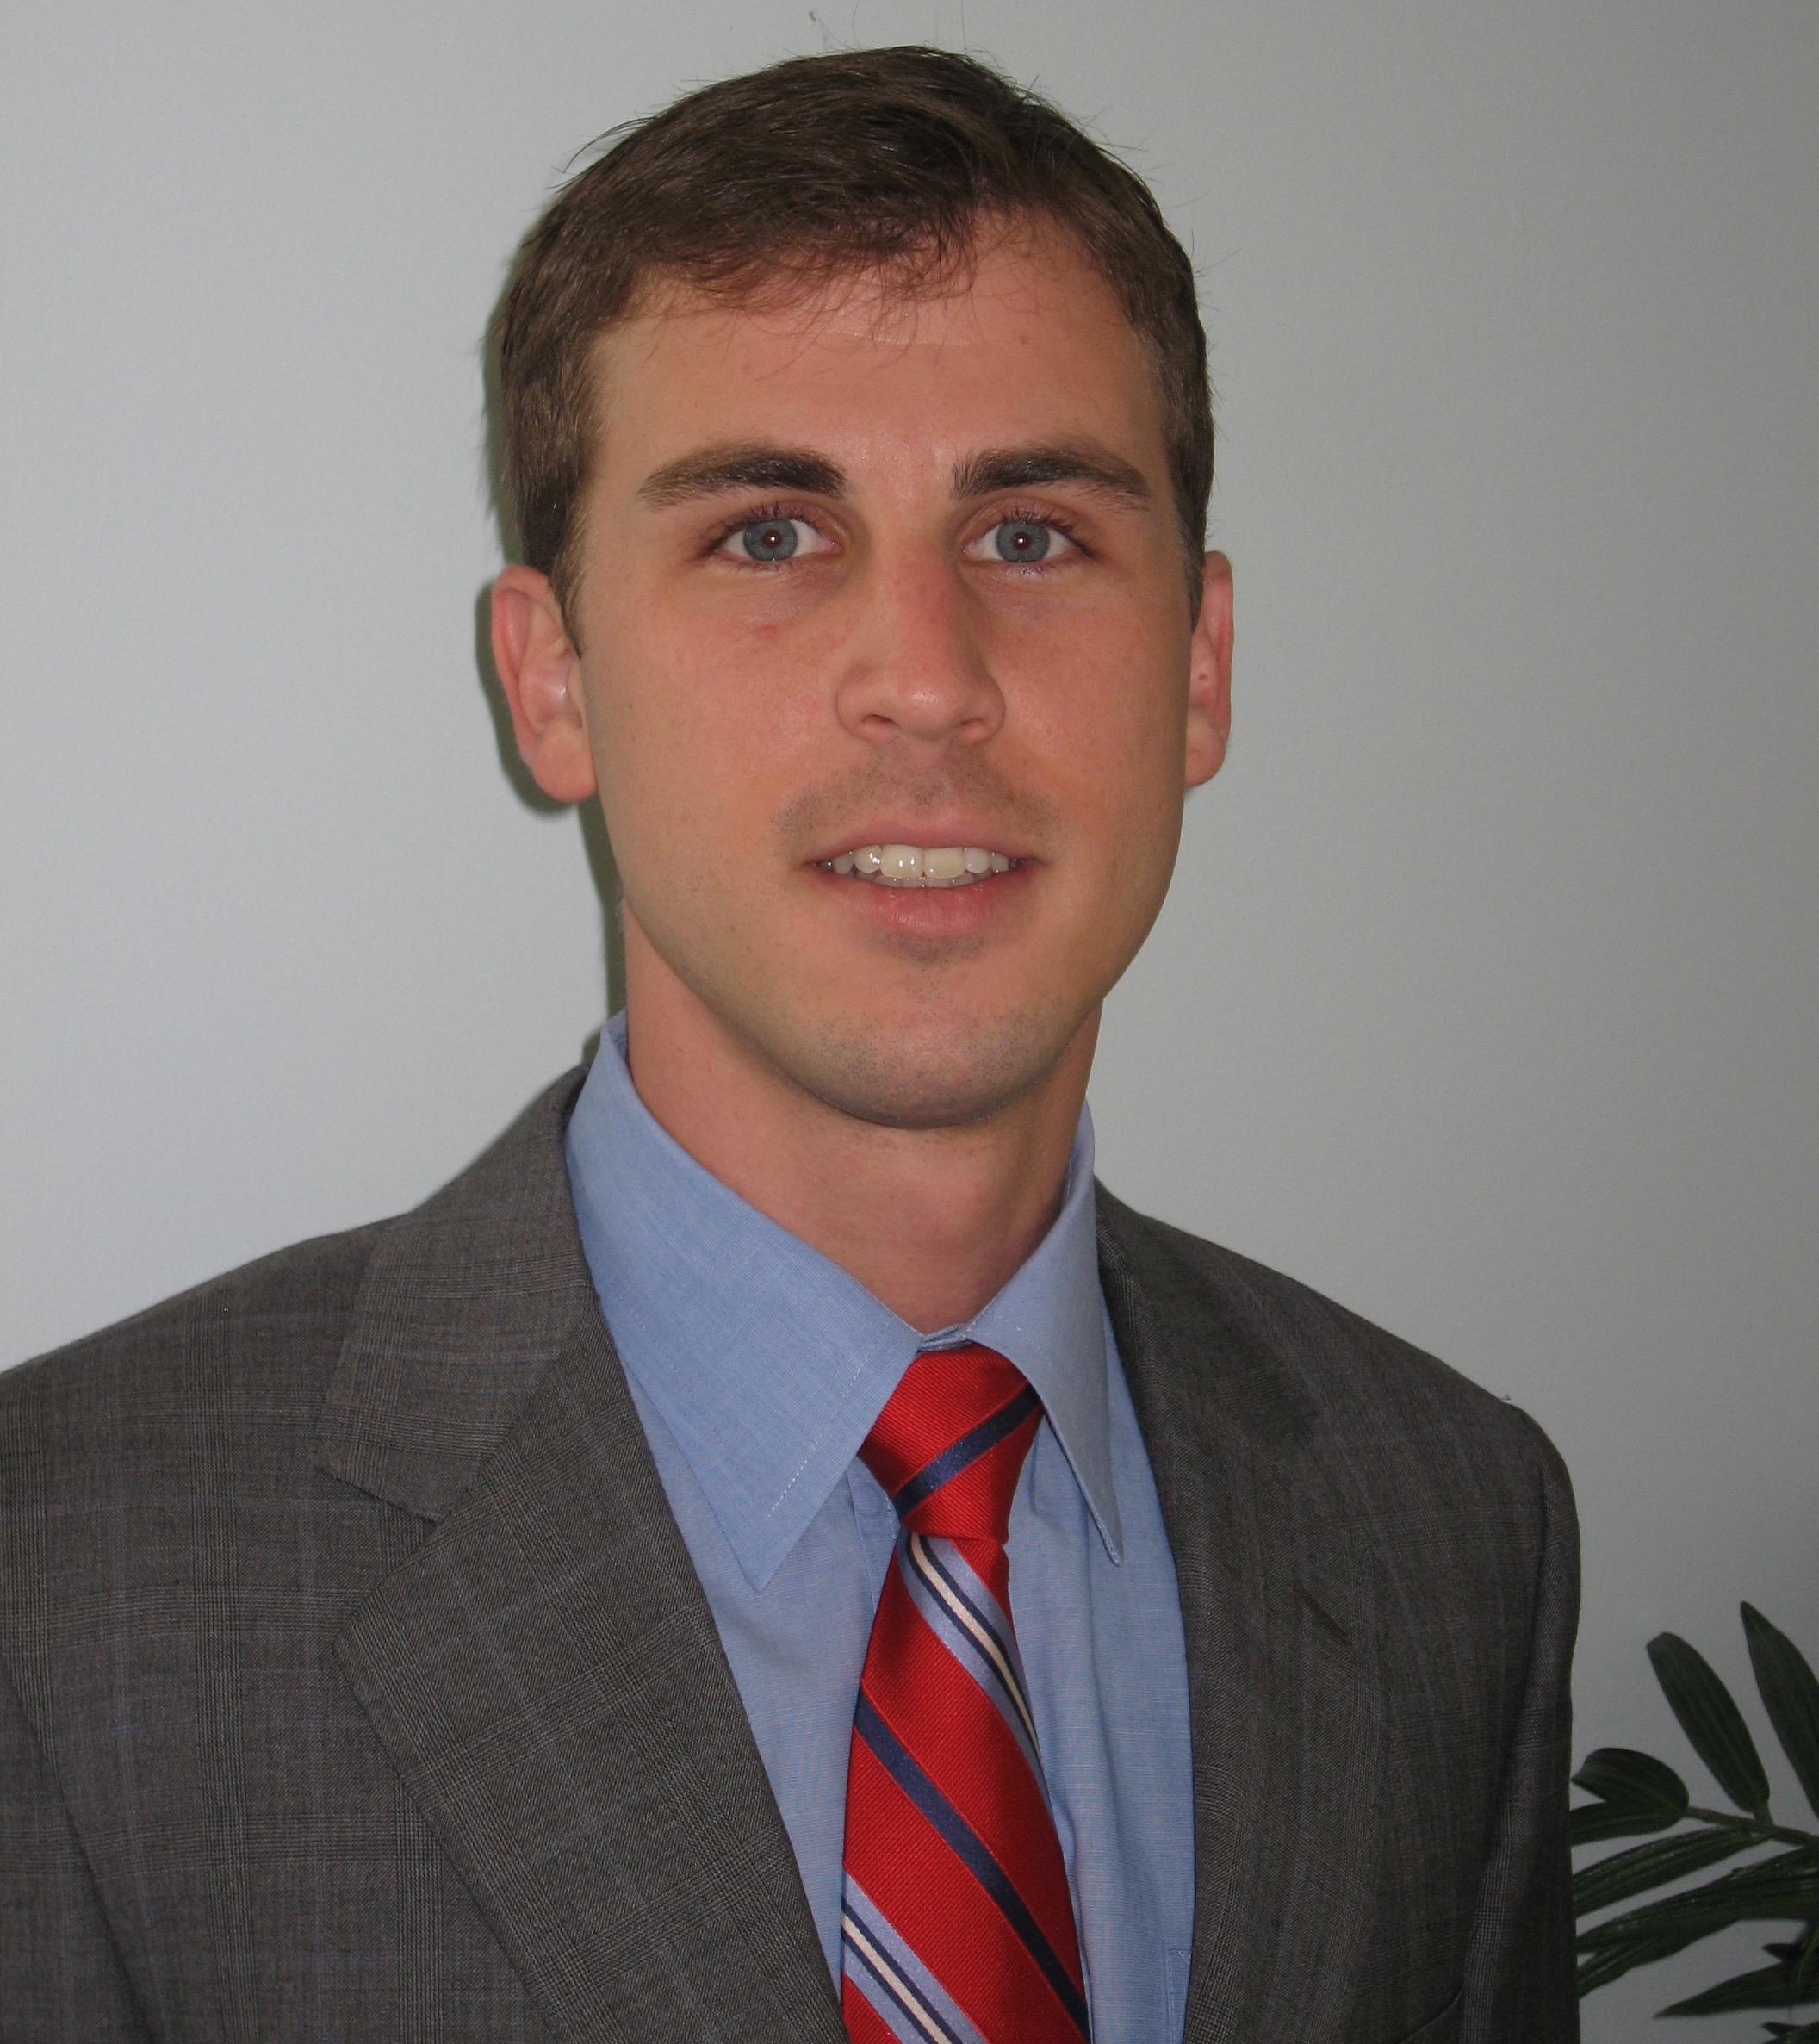 Stephen P. Phillips